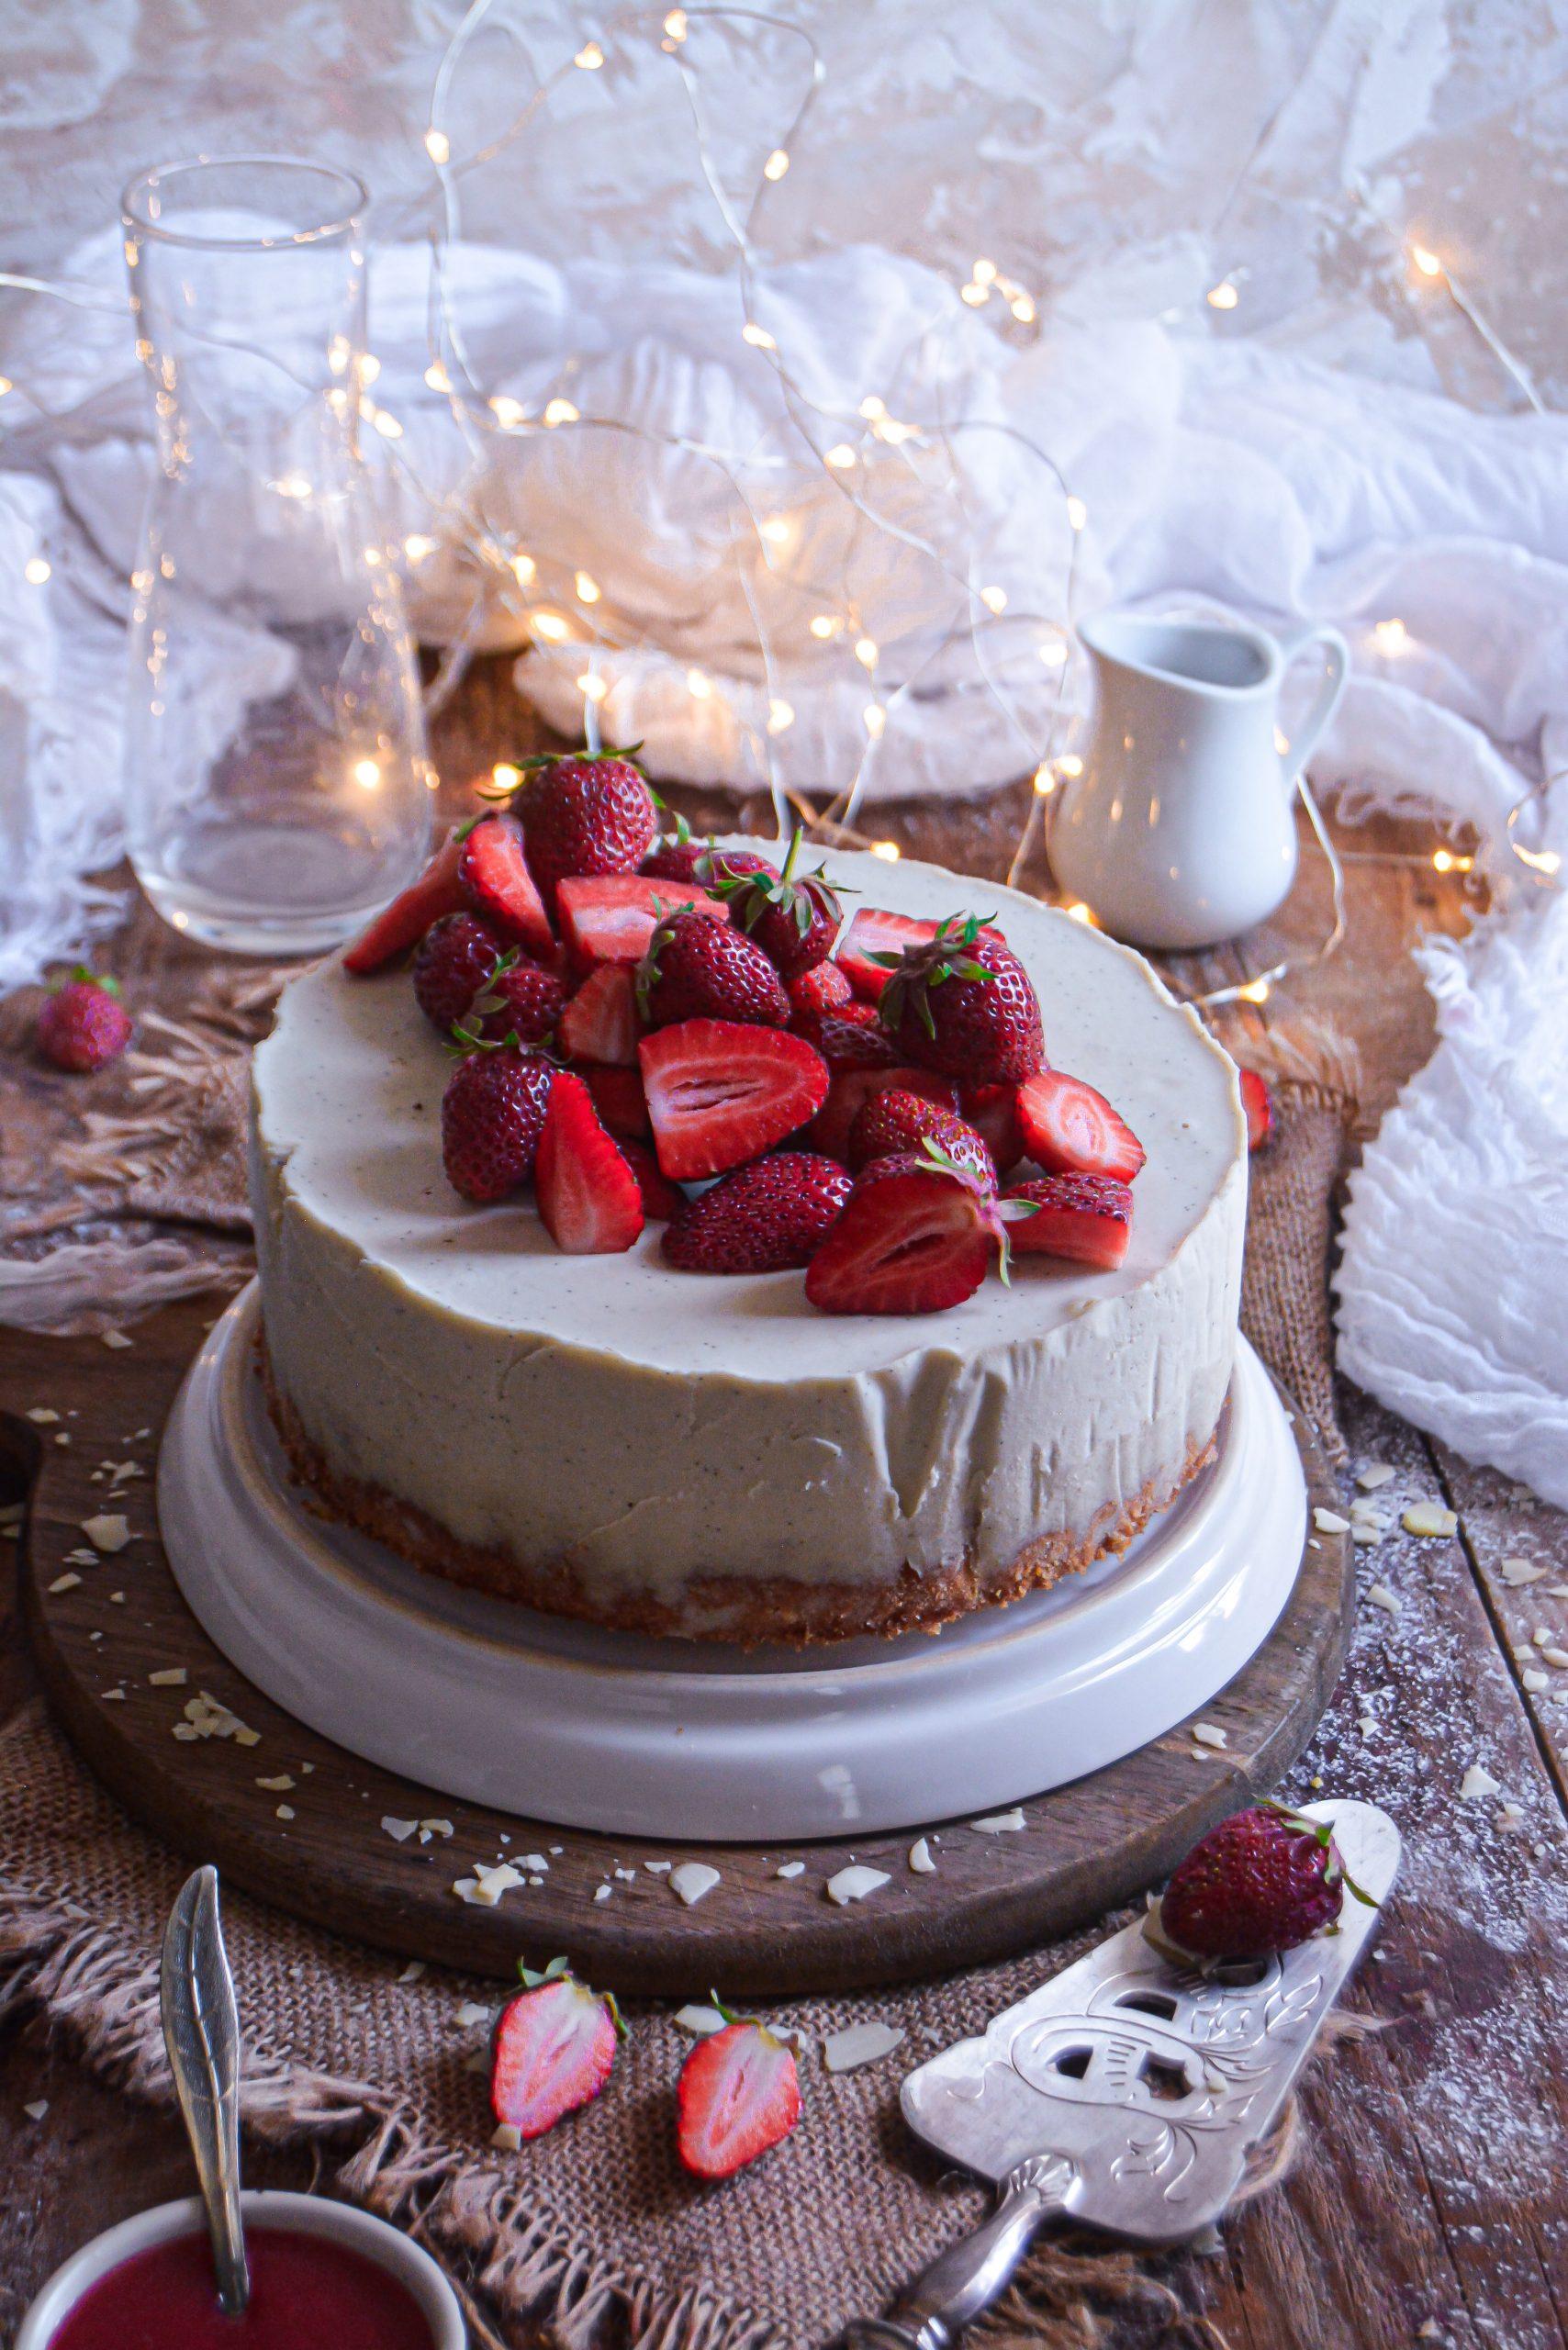 Gâteau Vegan Ananas & Cheesecake Fraise / Vegan Pineapple Cake & Strawberry Cheesecake